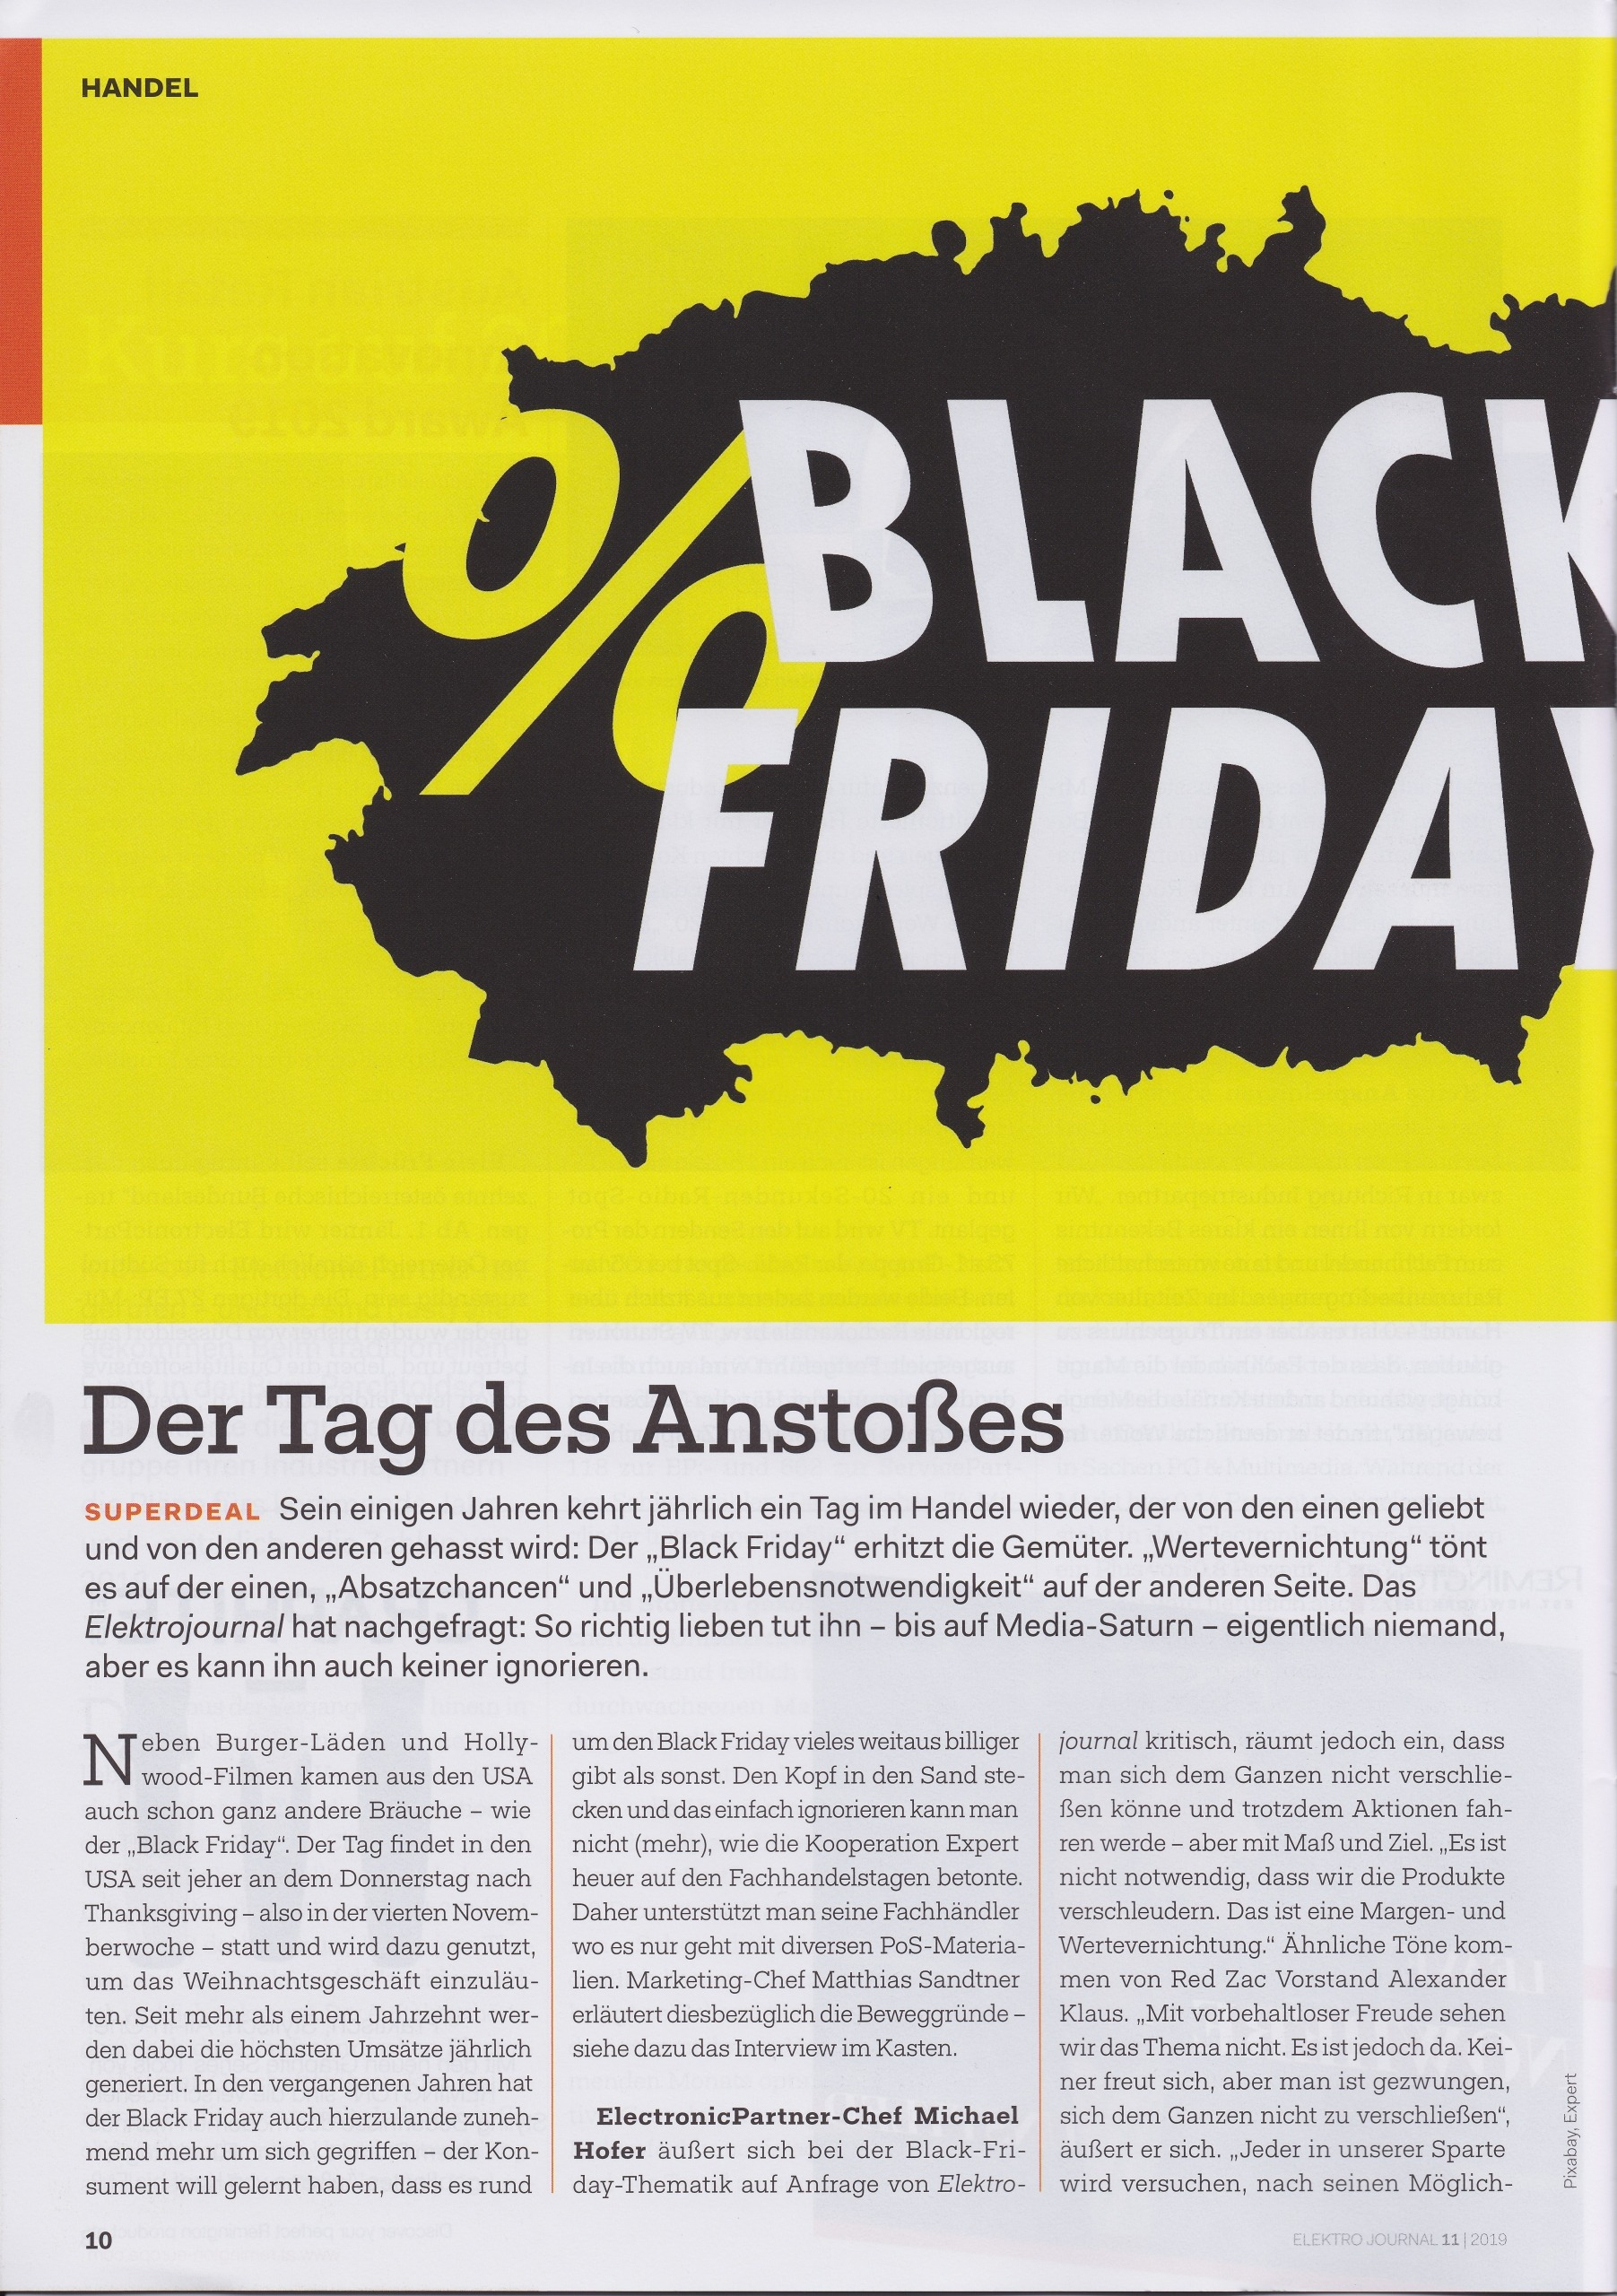 Black Friday 2019 - Mag. Roman Kmenta - Elektrojournal 11-2019 1